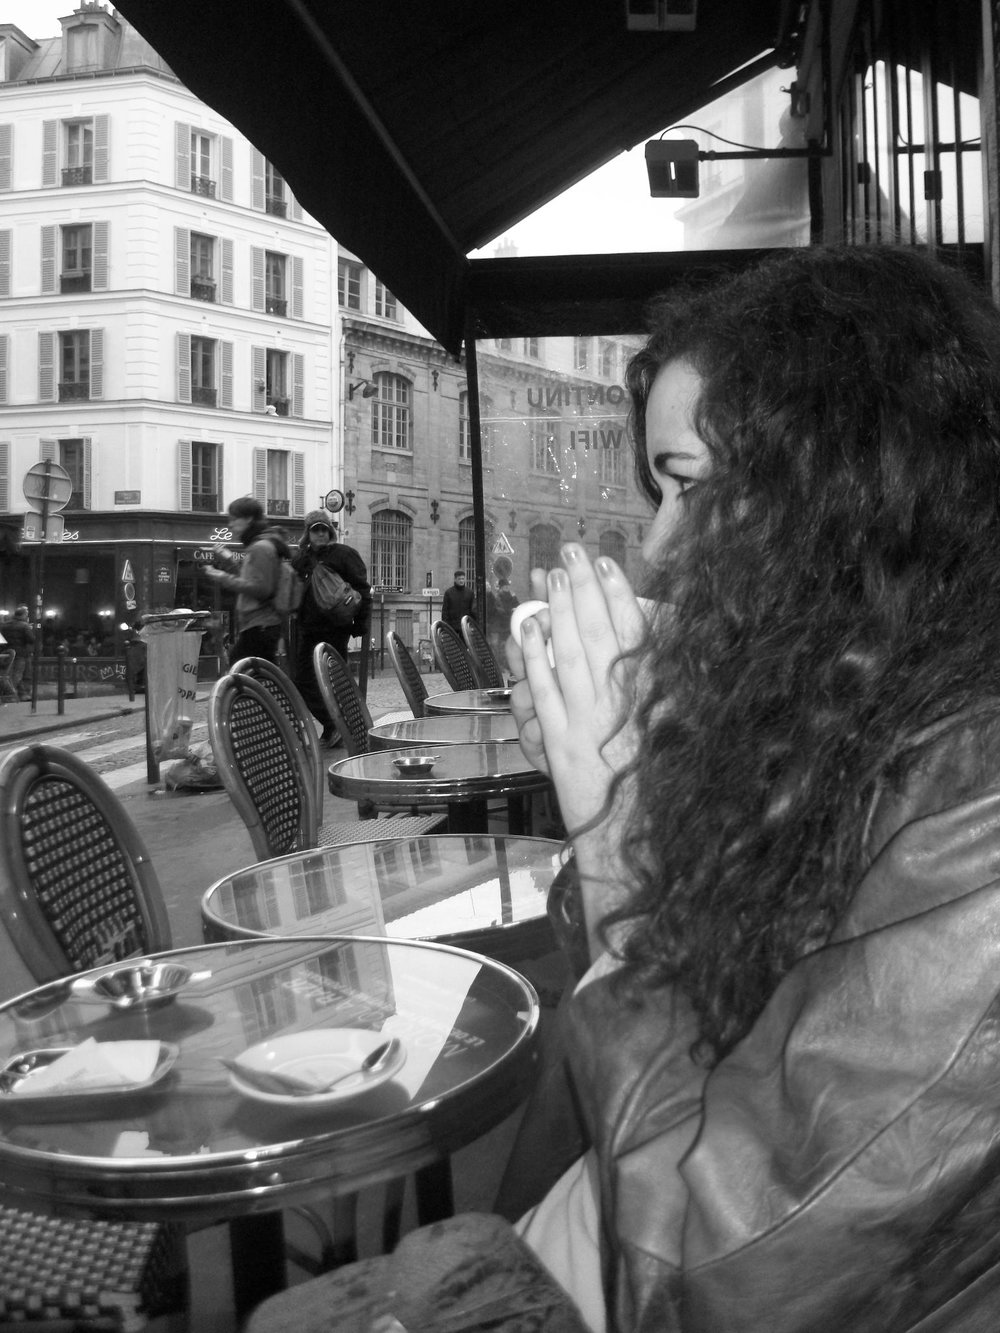 parisian bistro picture.jpg